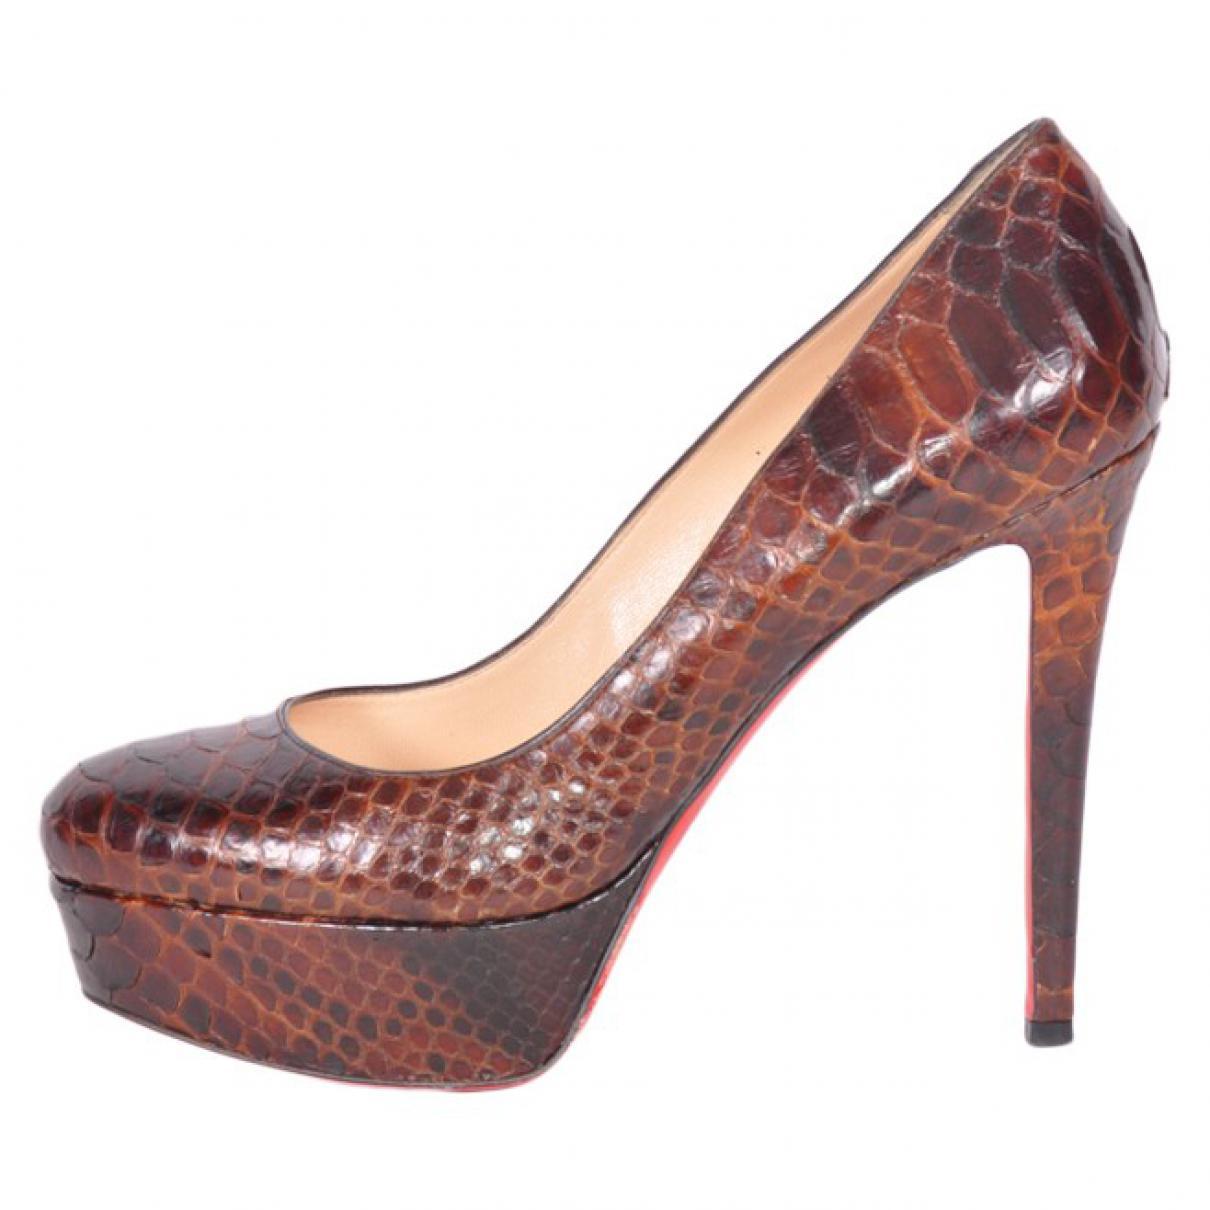 Amazon For Sale Pre-owned - Python heels Christian Louboutin Buy Cheap Big Discount YbEik4goh